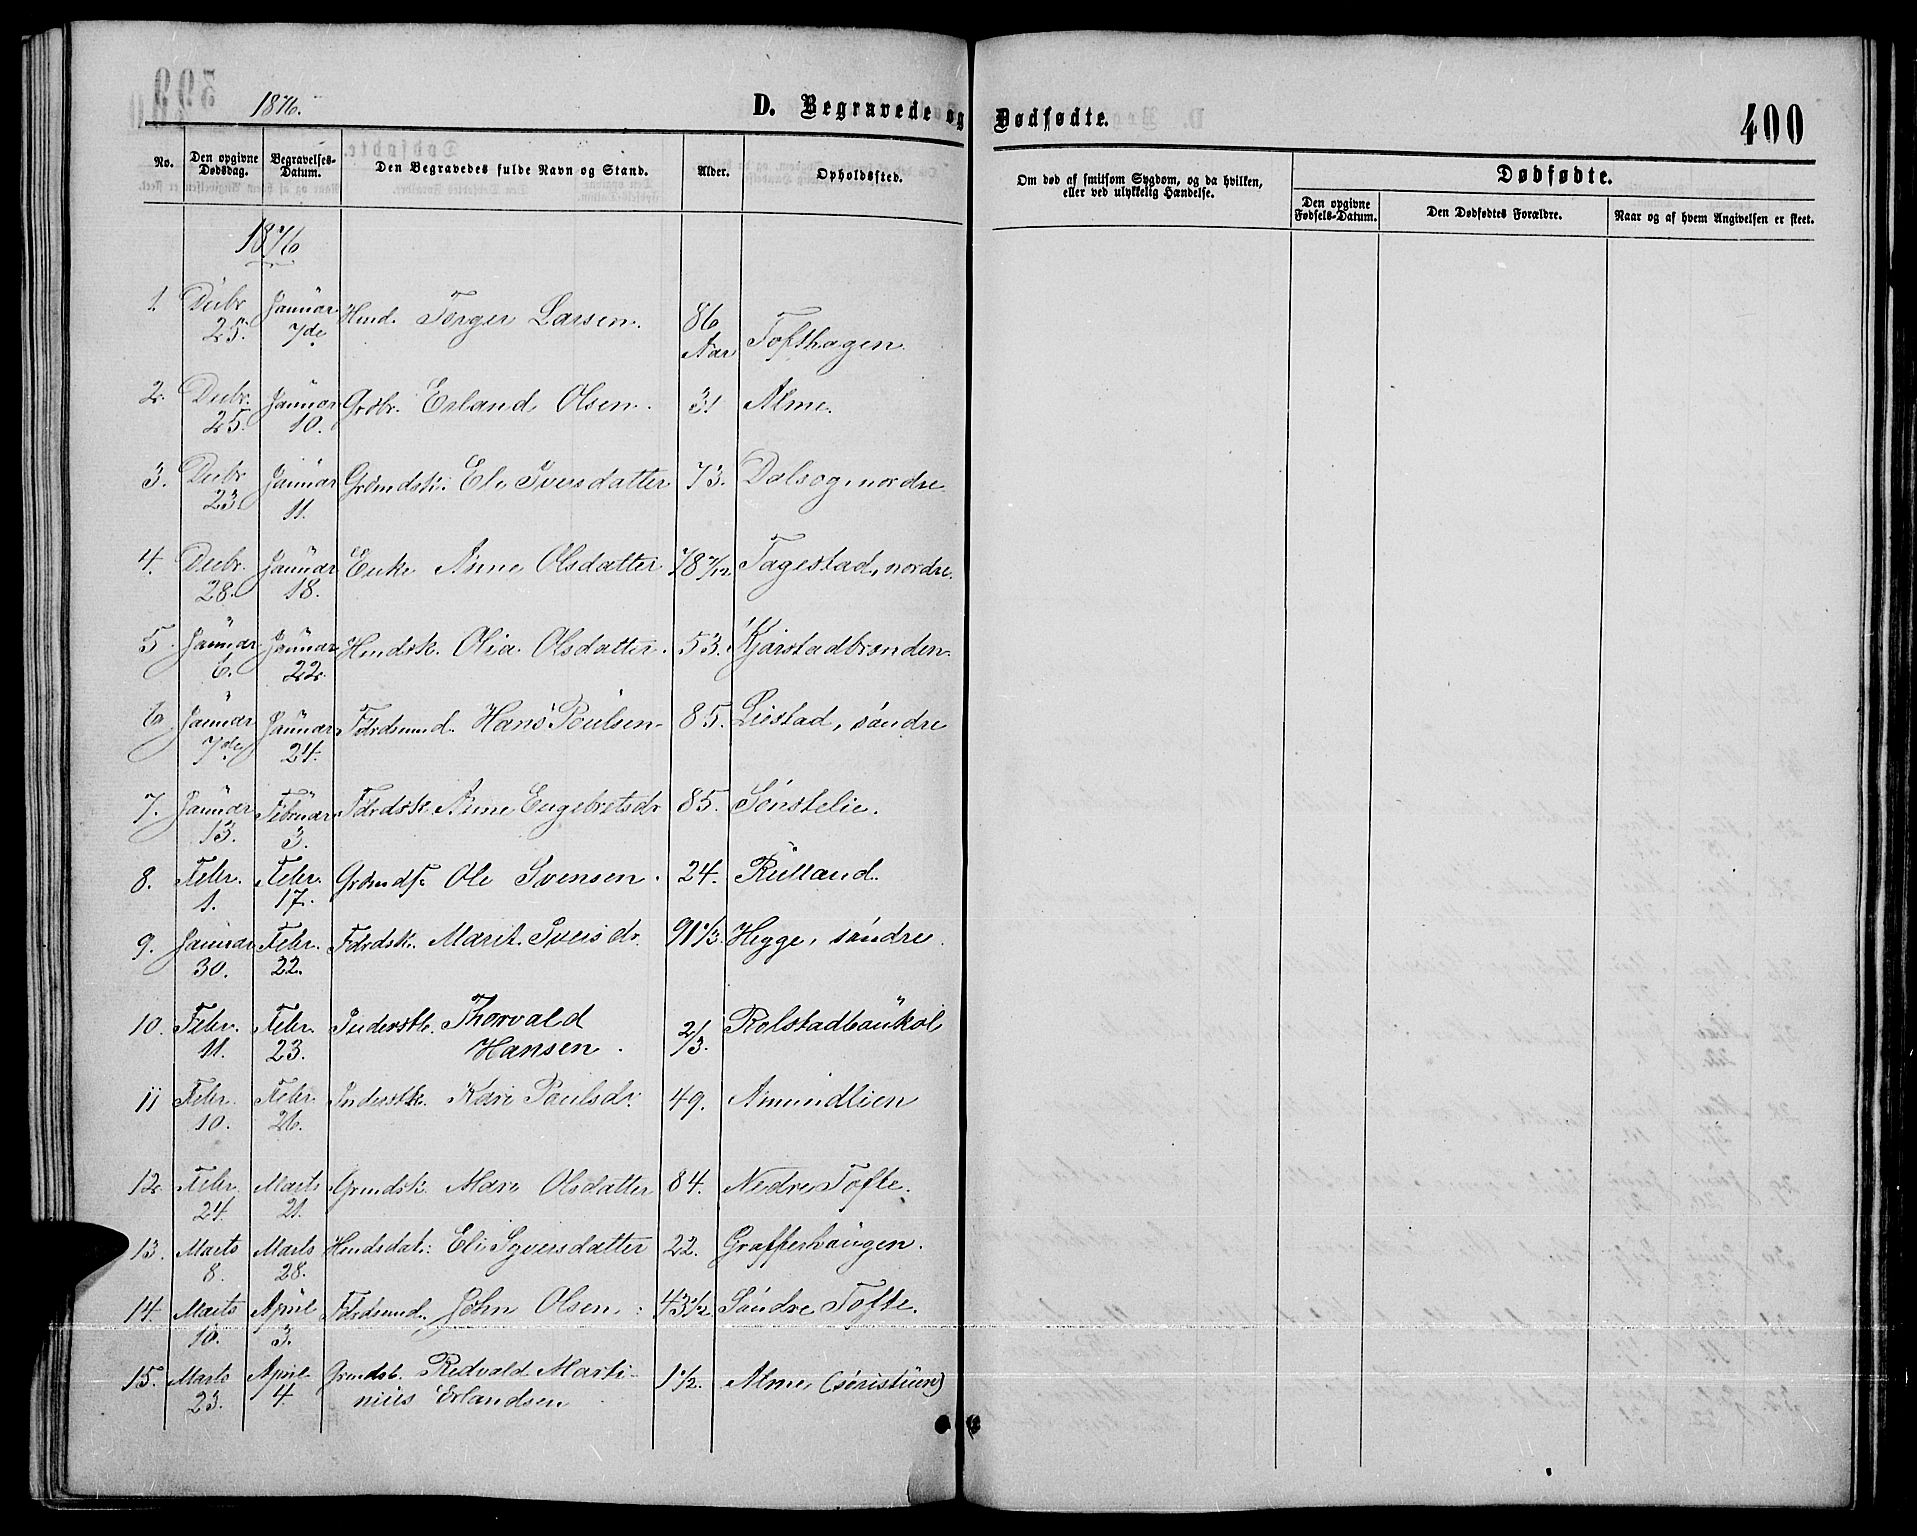 SAH, Sør-Fron prestekontor, H/Ha/Hab/L0002: Klokkerbok nr. 2, 1864-1883, s. 400